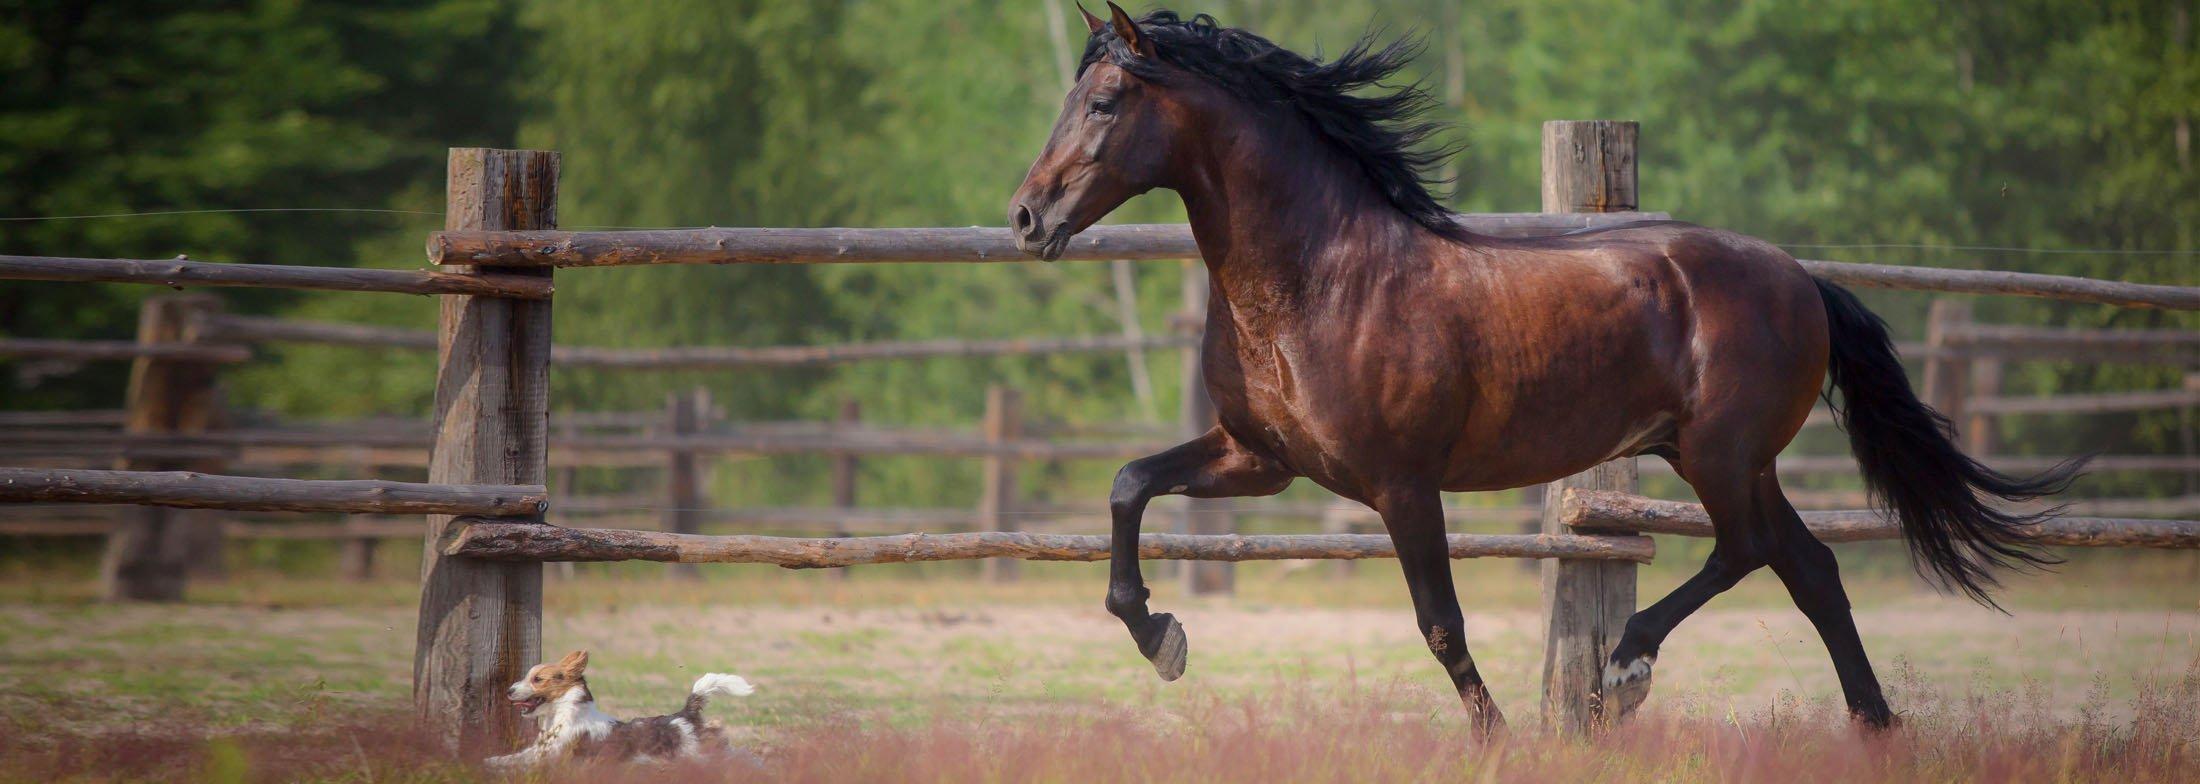 equineslider8-1